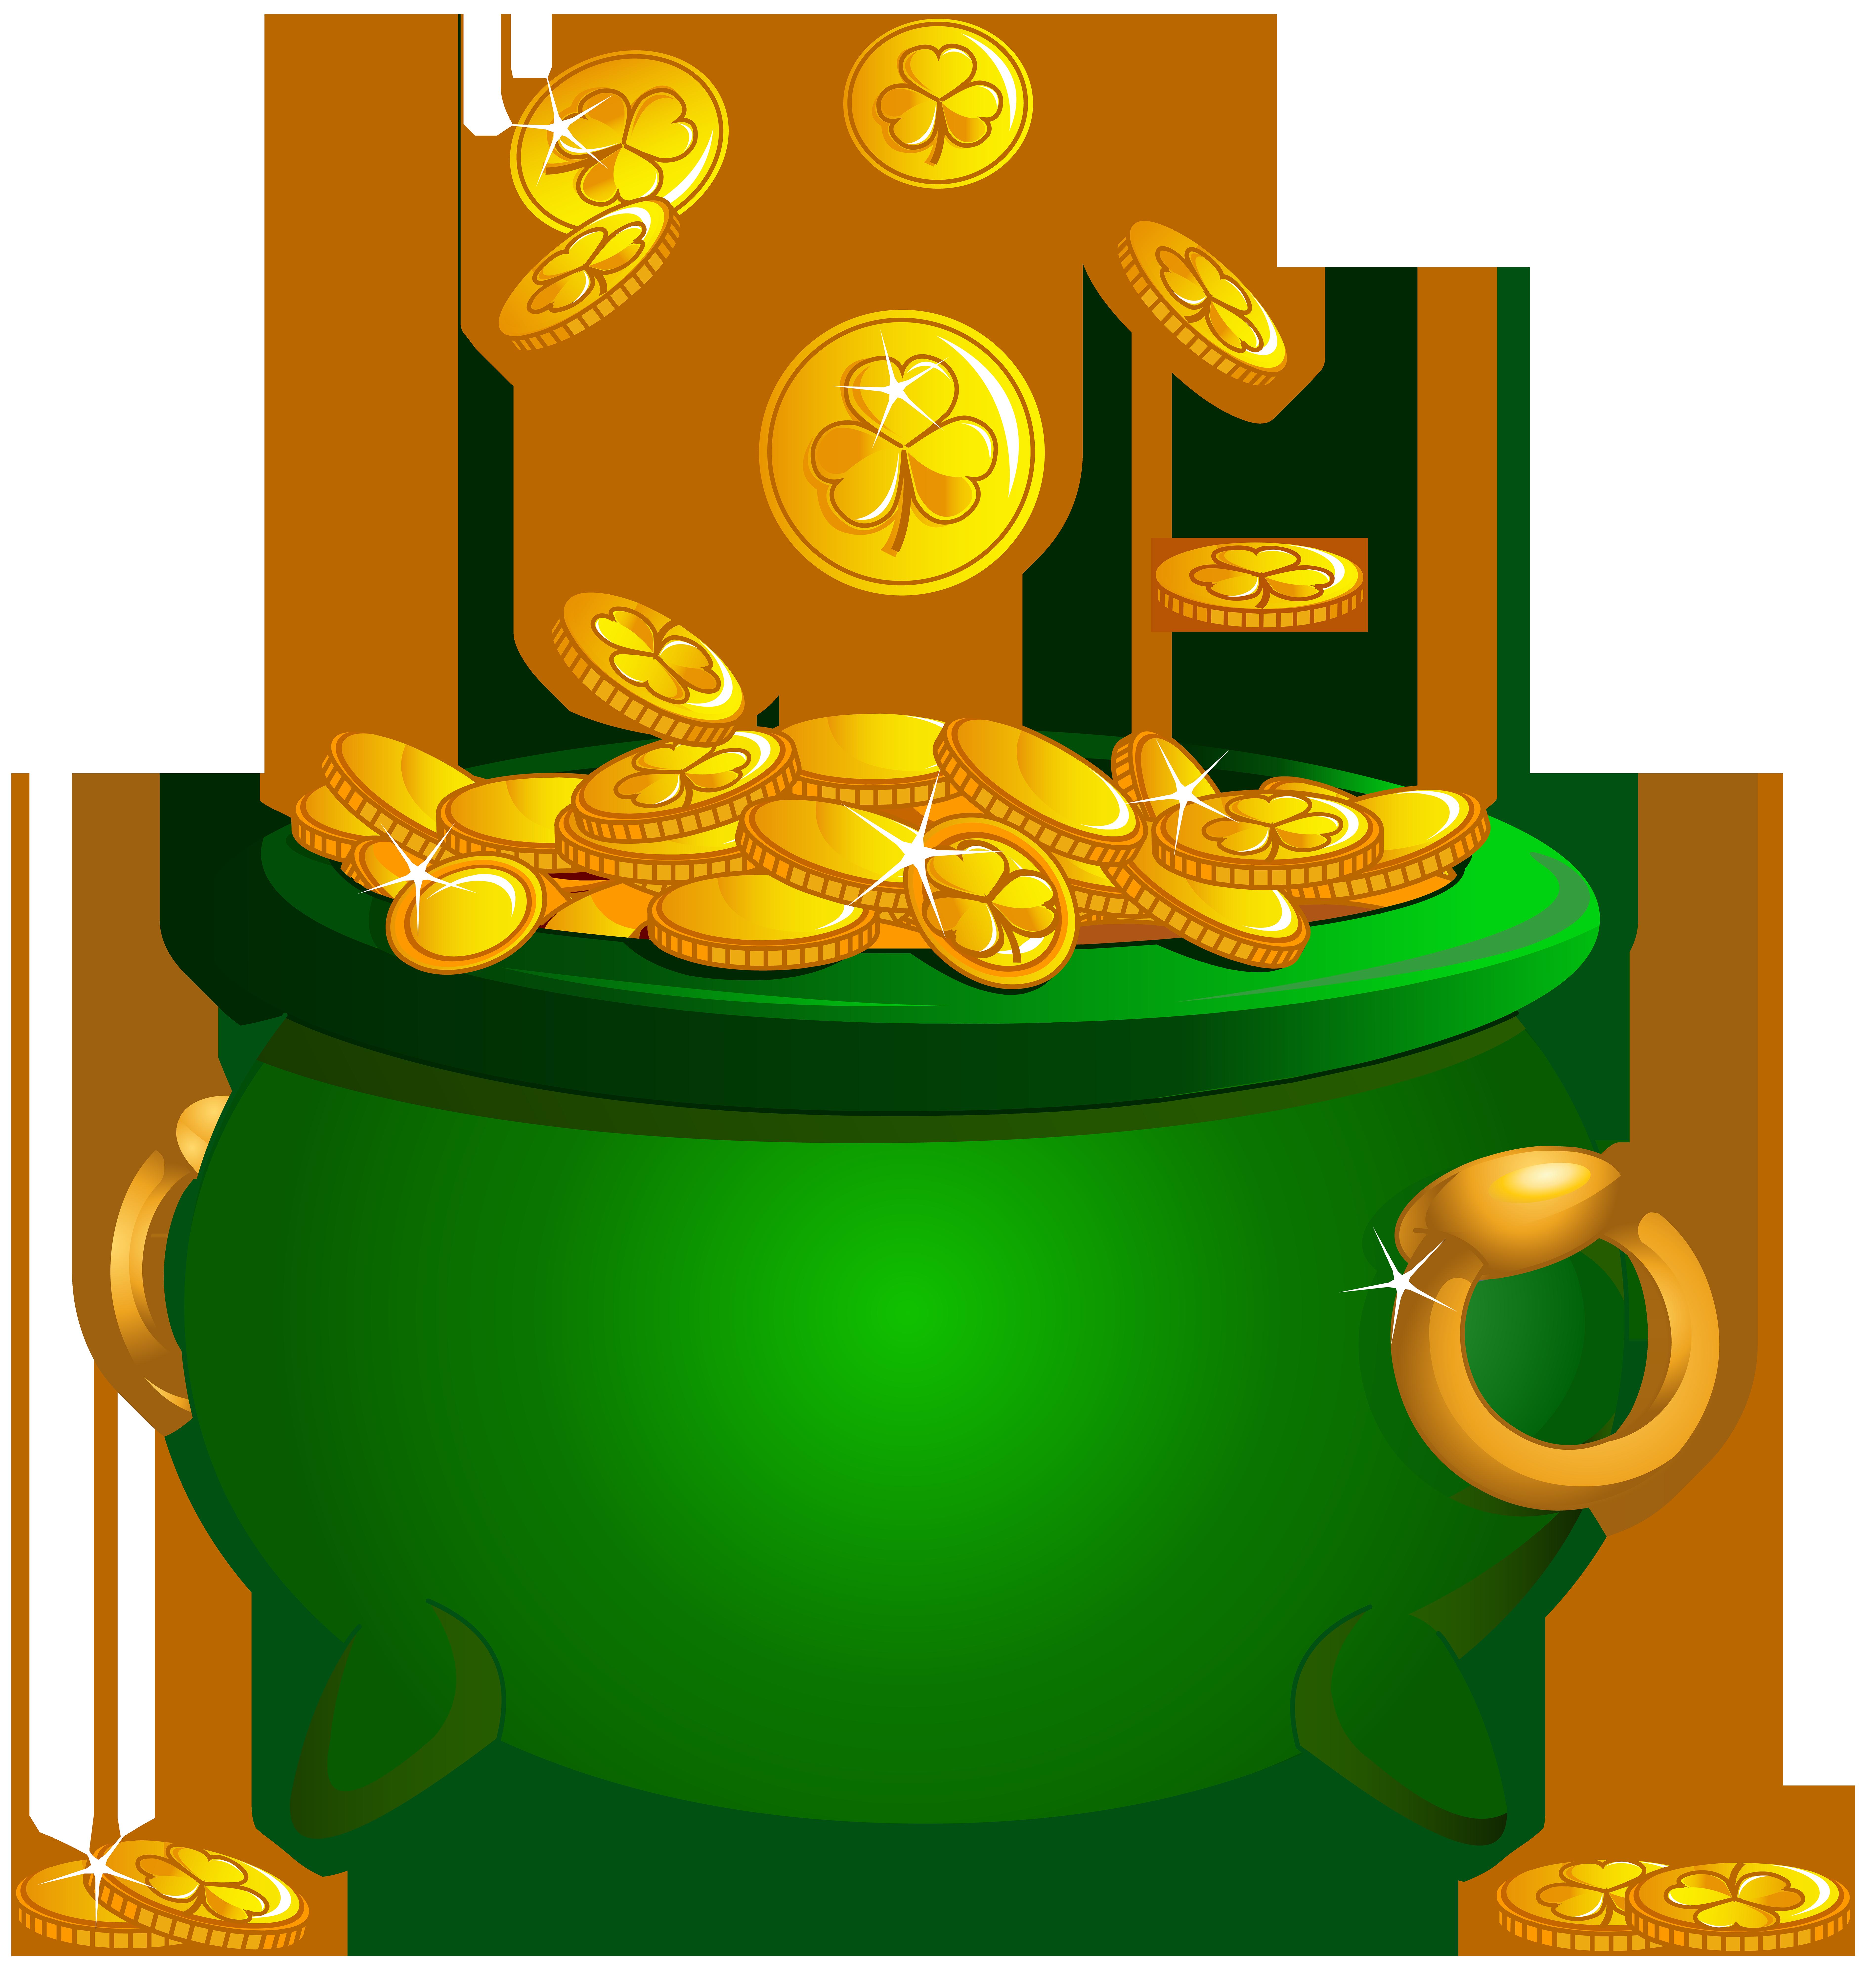 St Patrick Pot of Gold Transparent Image.